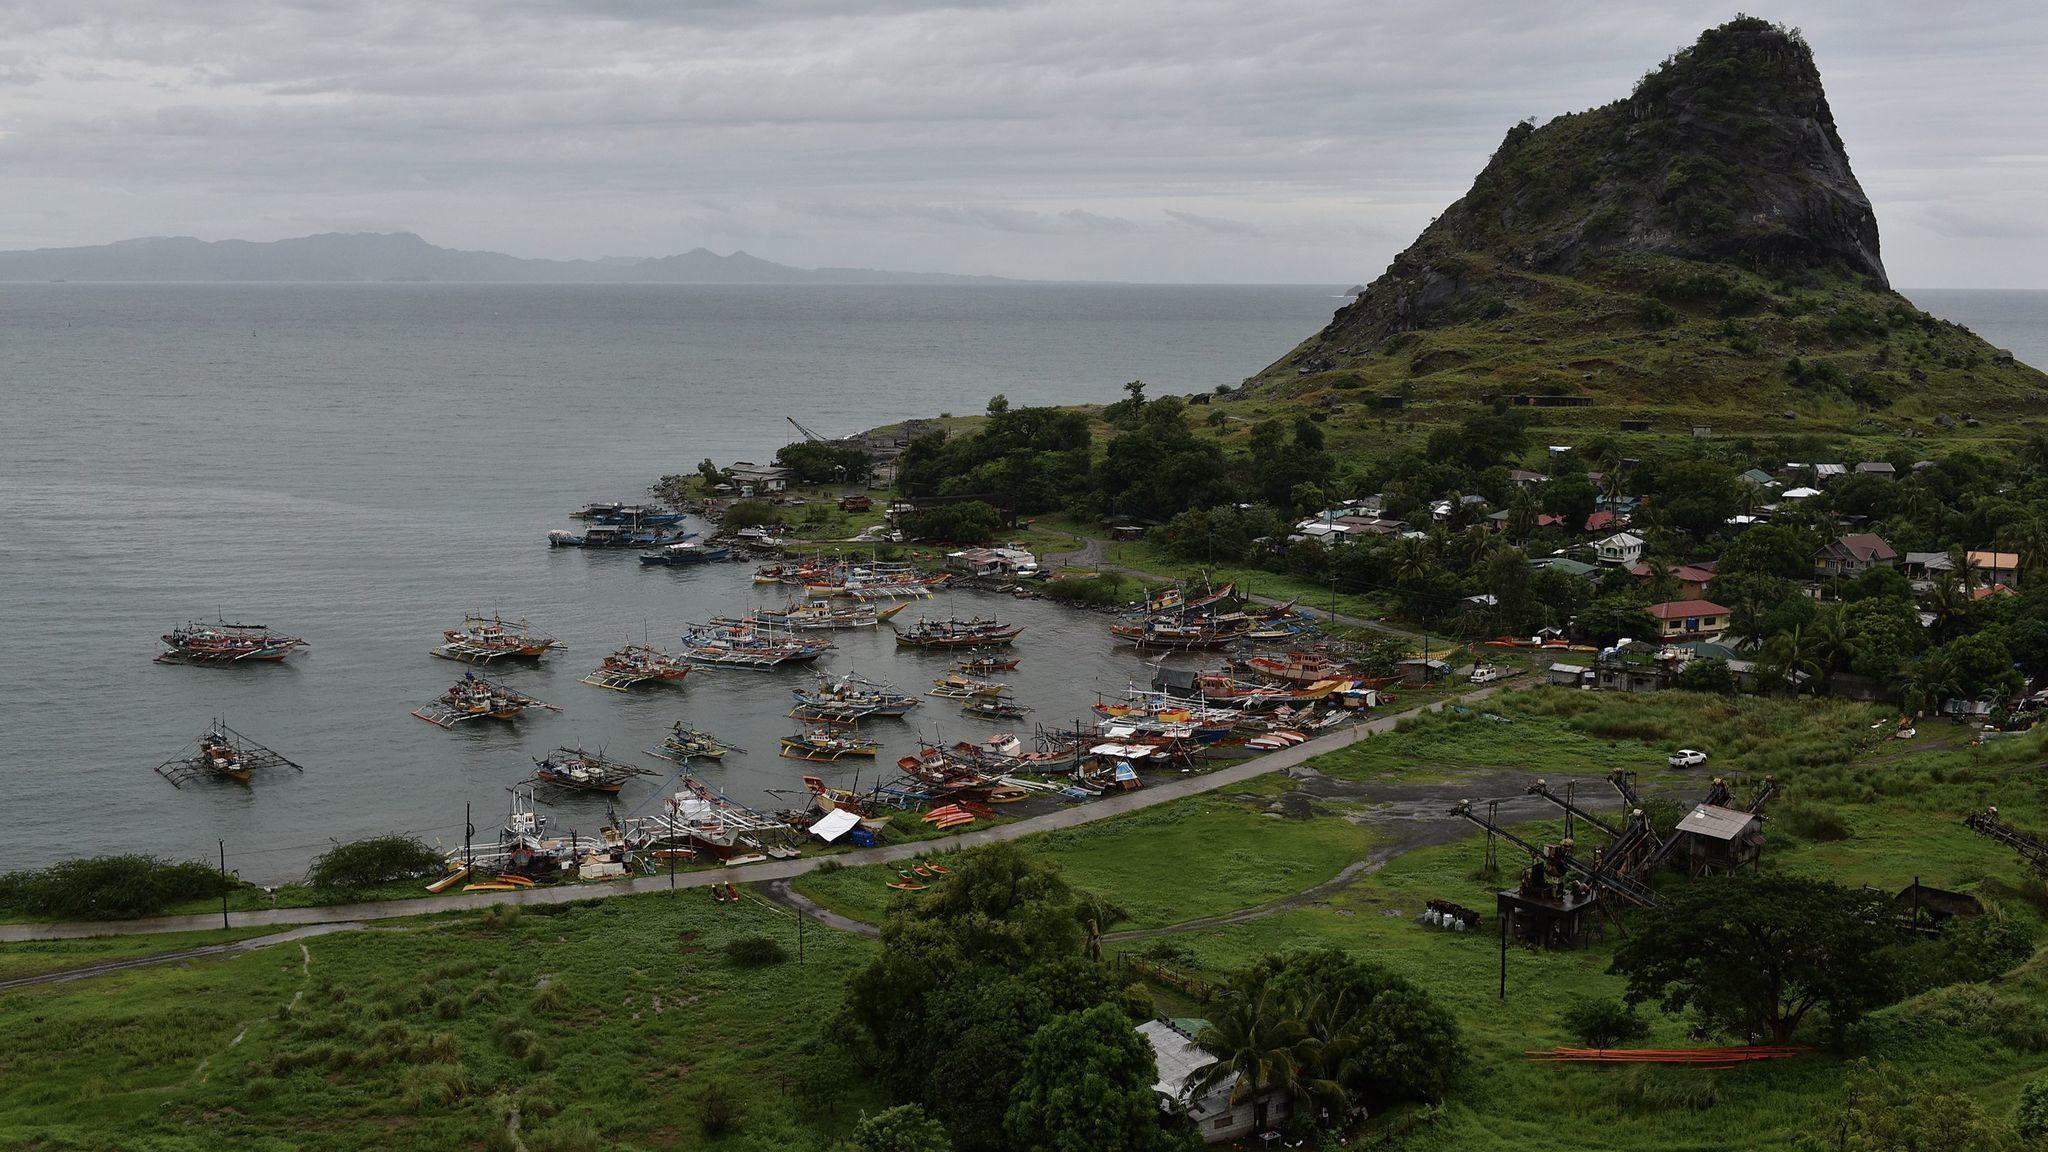 A small fishing village in Mariveles, Bataan, not far from the Mariveles coal-fired plant.